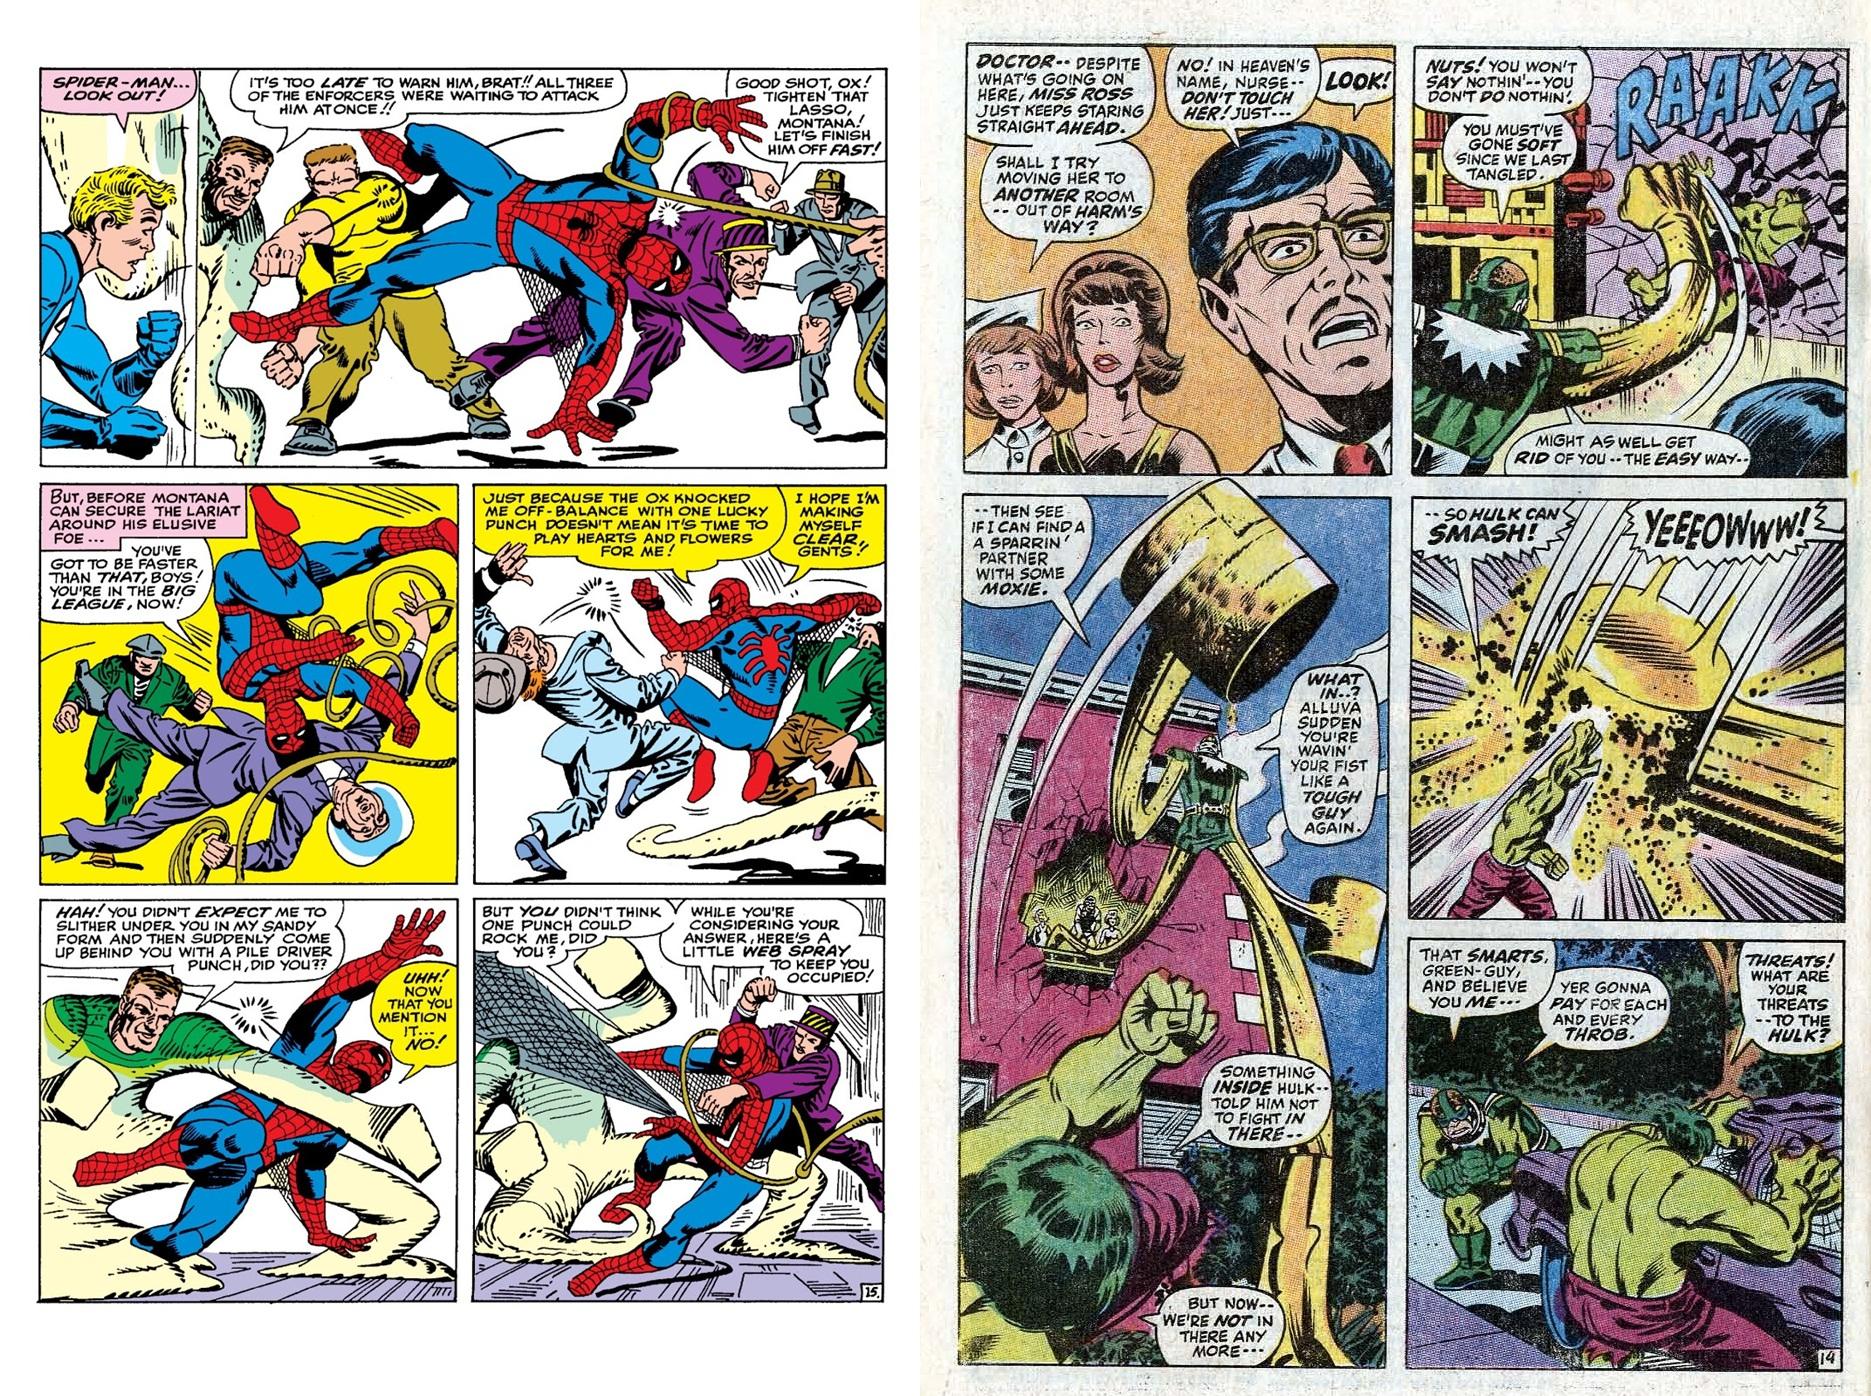 Spider-Man Saga of the Sandman review